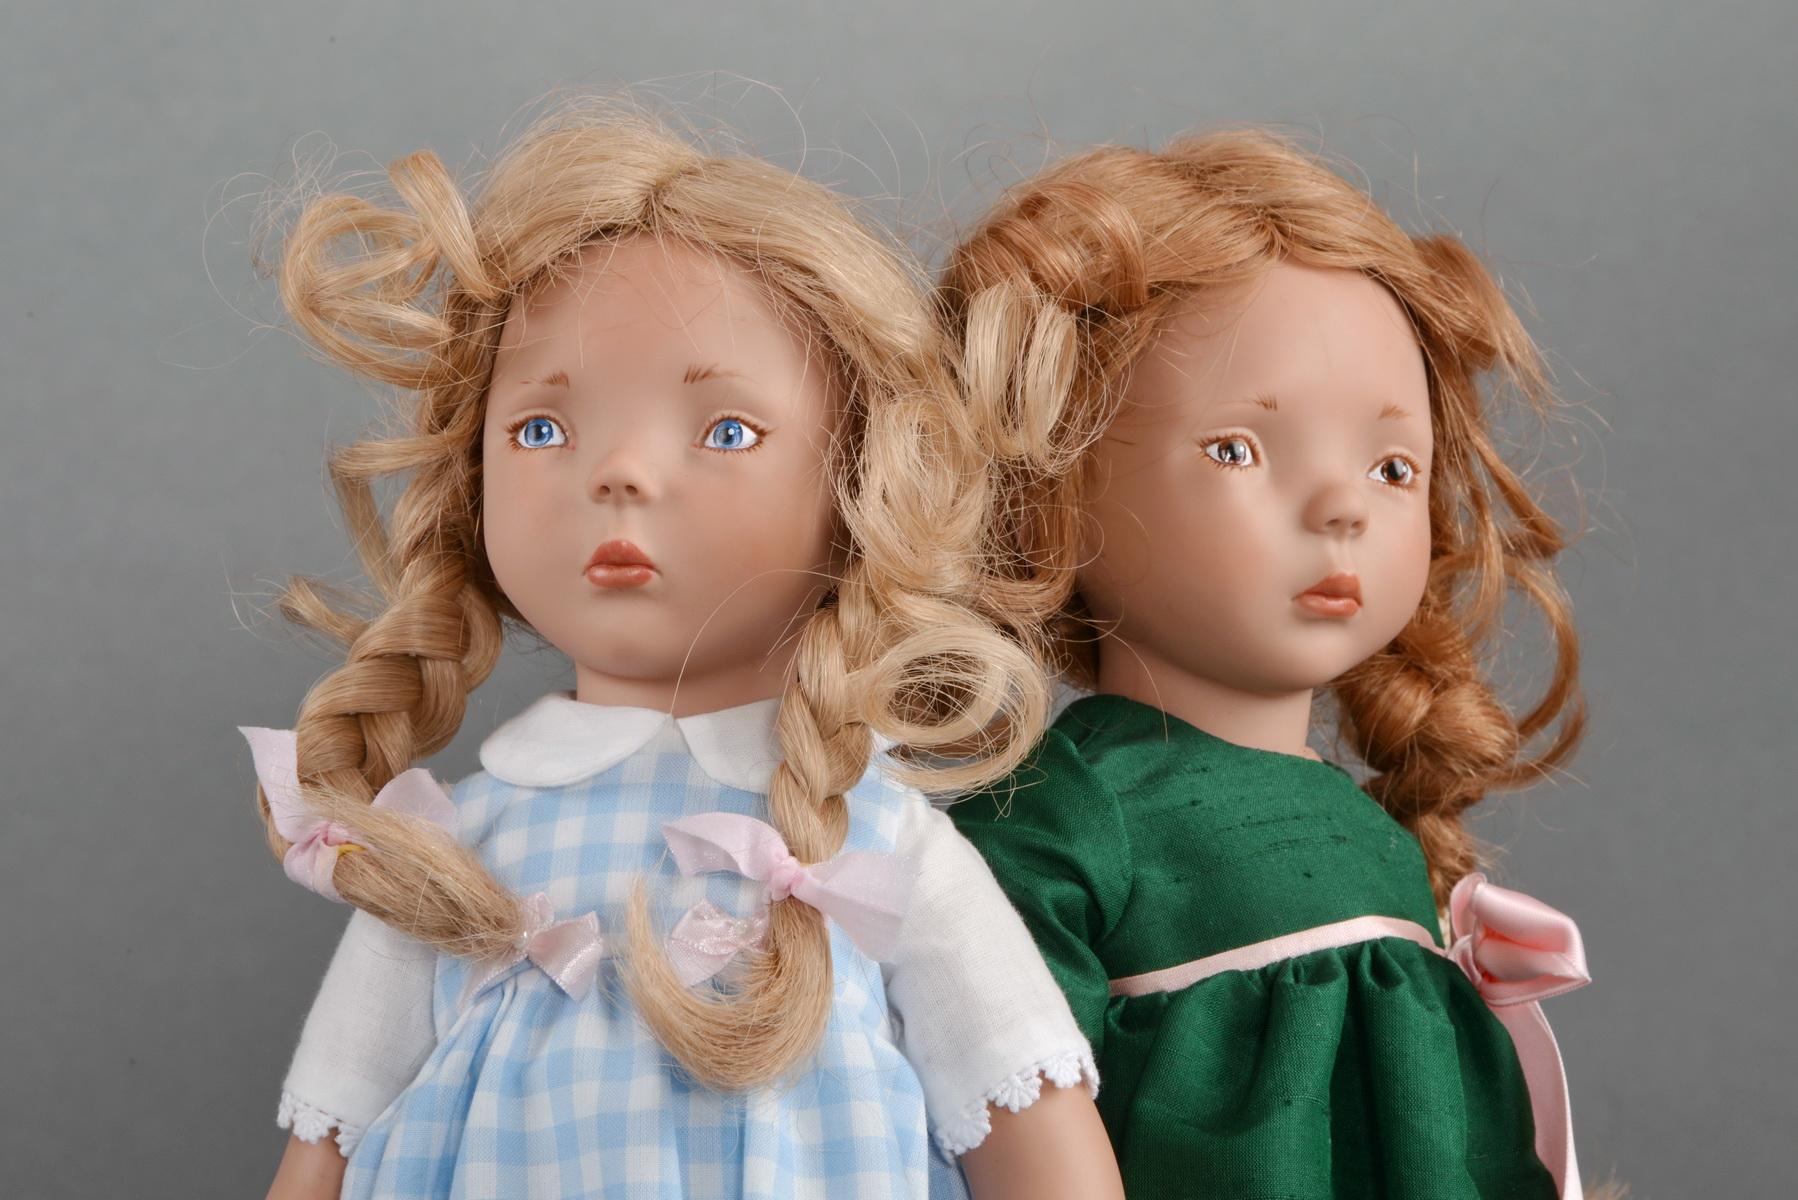 Игровая кукла Klarchen, Zwergnase 2016 год. Рост 50 см.